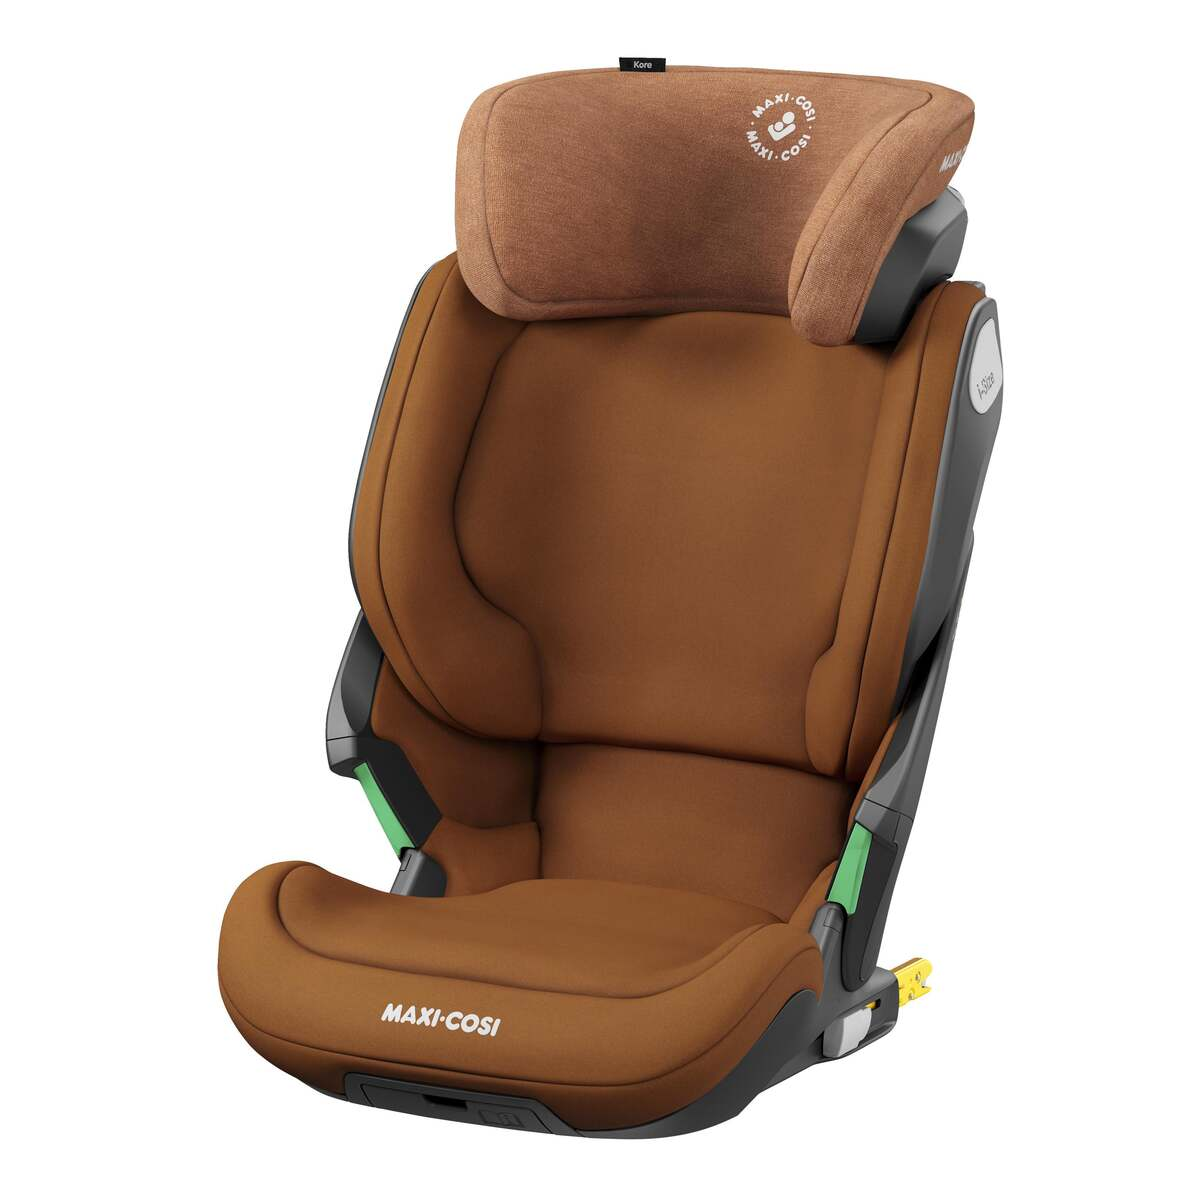 "Bild 3 von Maxi-Cosi Auto-Kindersitz ""Kore i-Size"", Authentic Cognac"